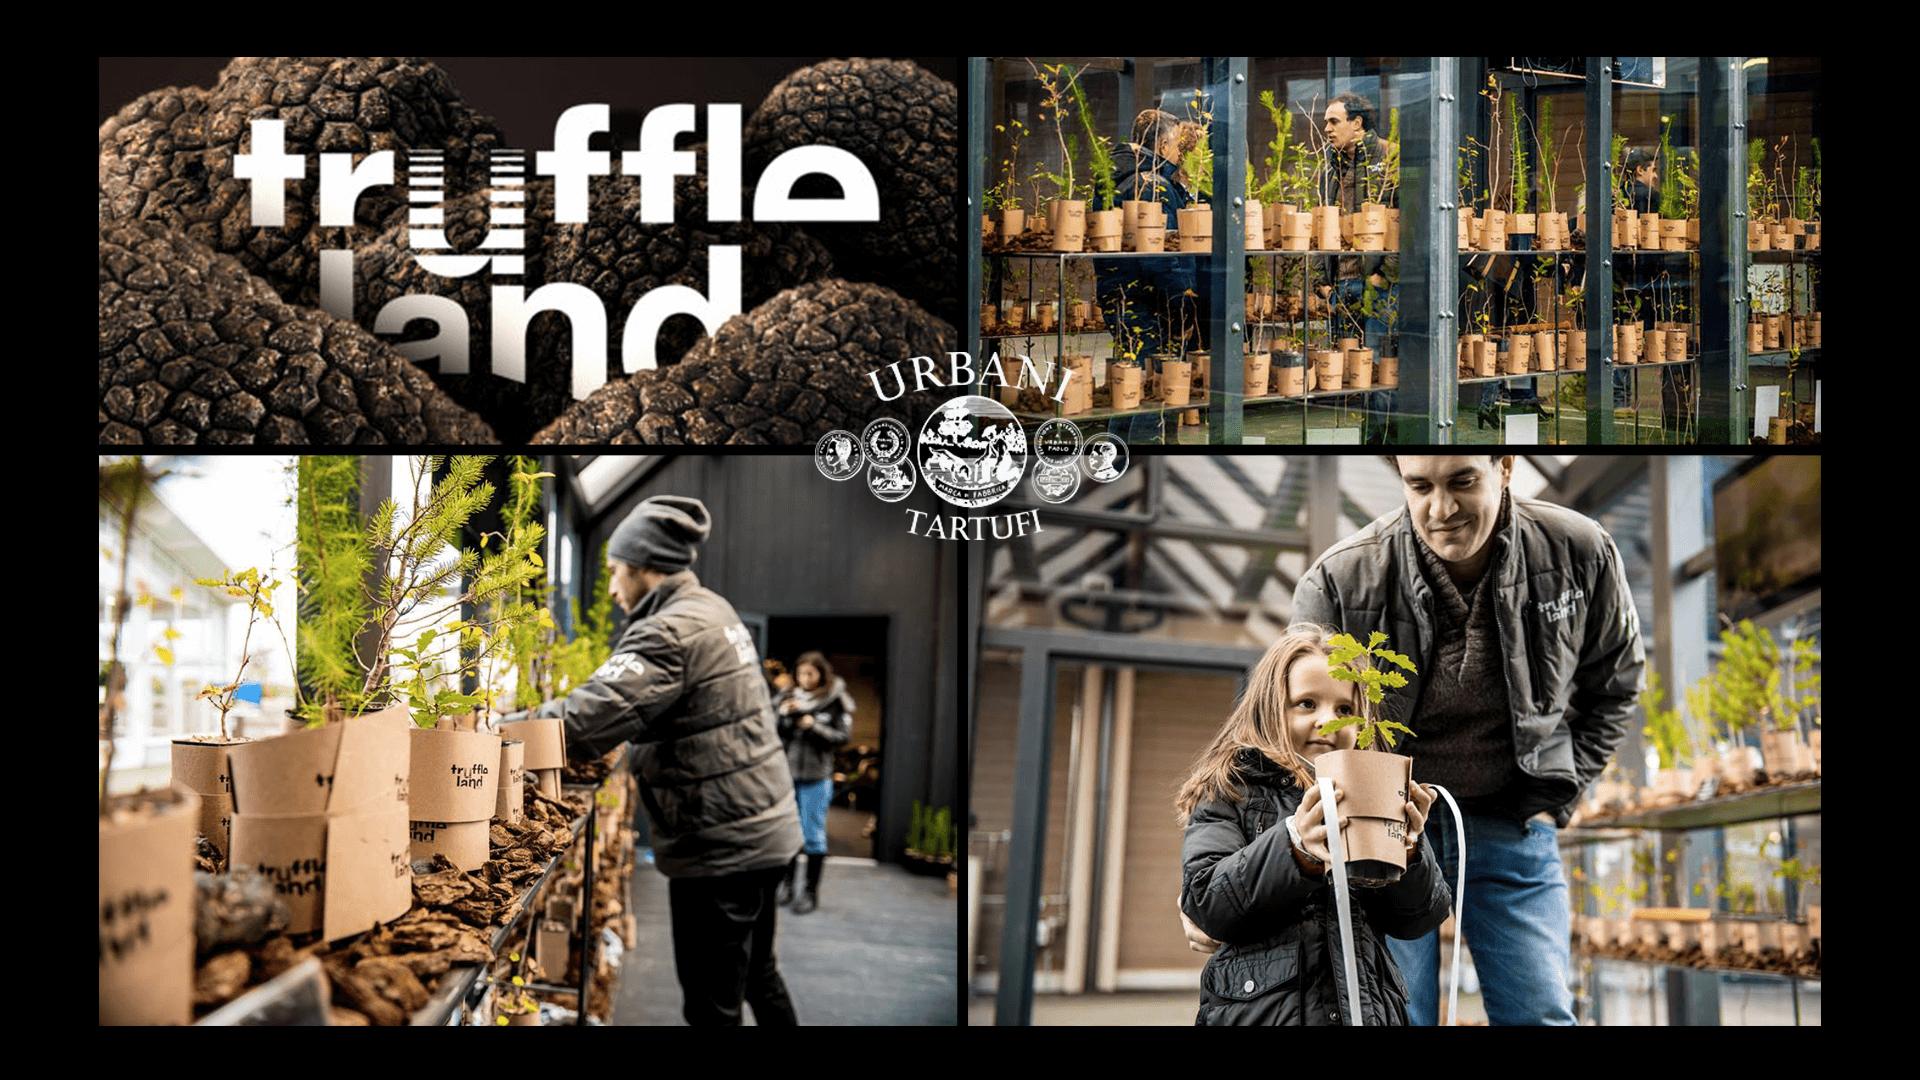 """urbani-tartufi""-la-tartuficultura-del-futuro-truffleland-truffleco.th"